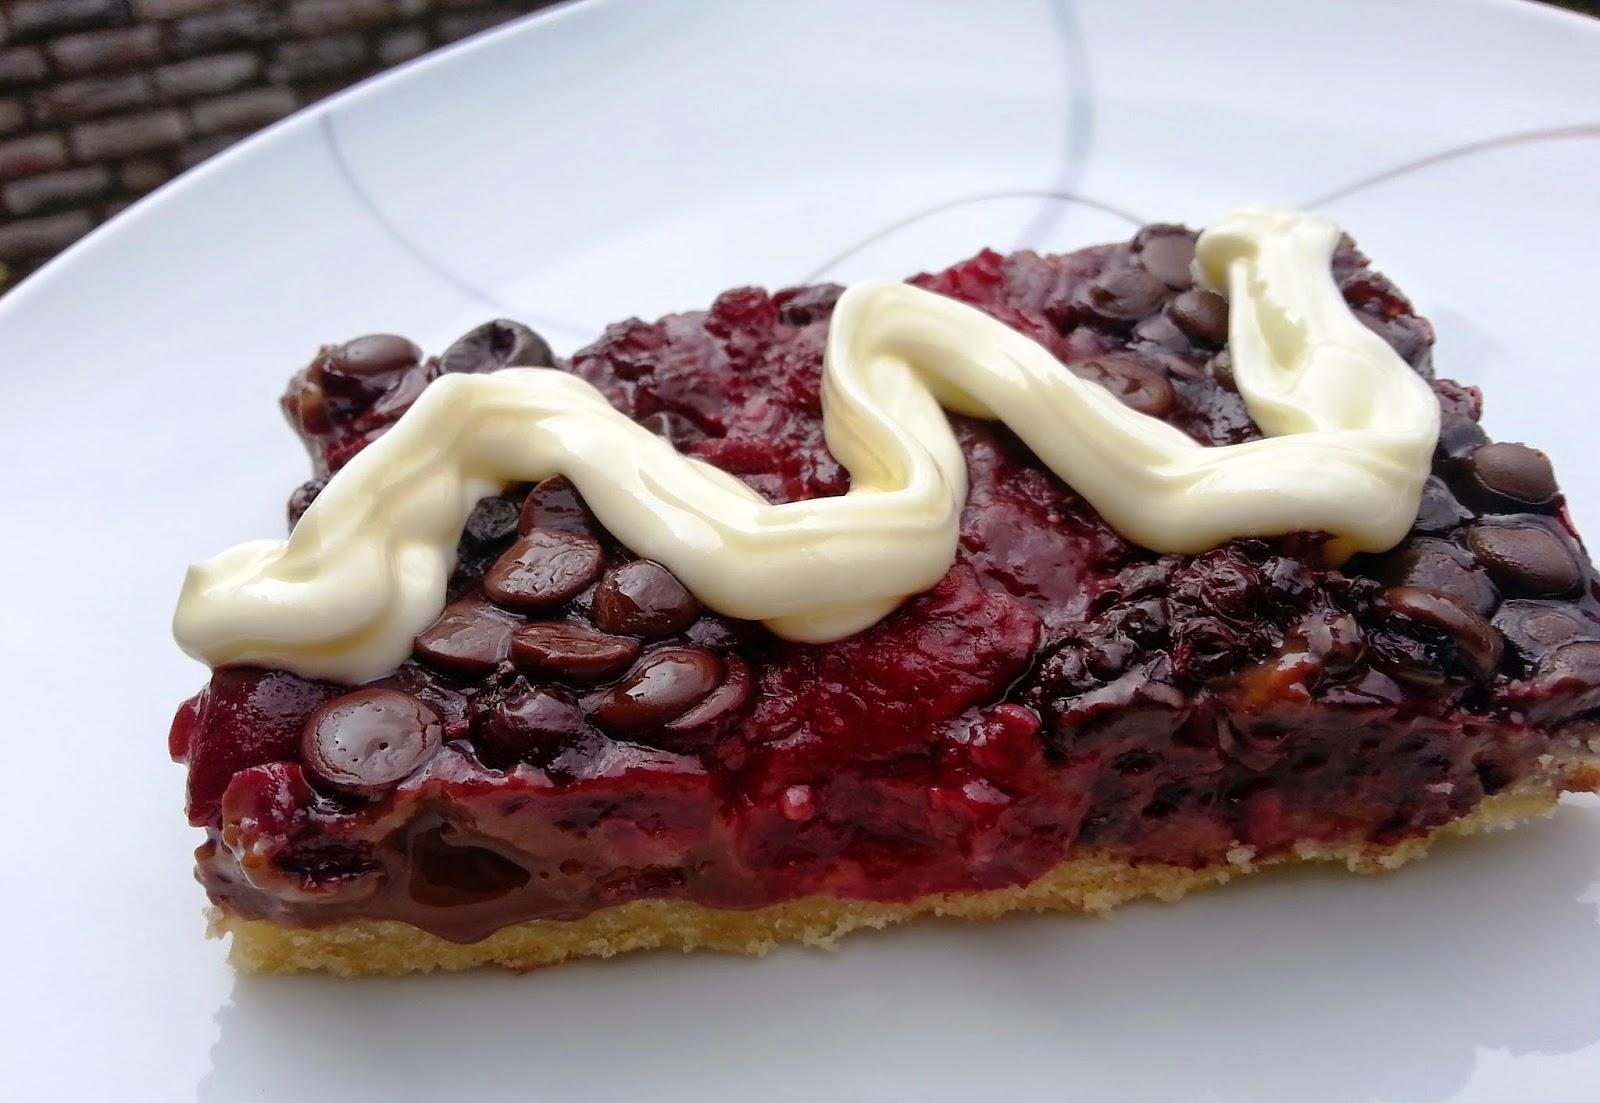 Sanna´s Hexenküche: Schoko-Beeren-Kuchen vom Blech